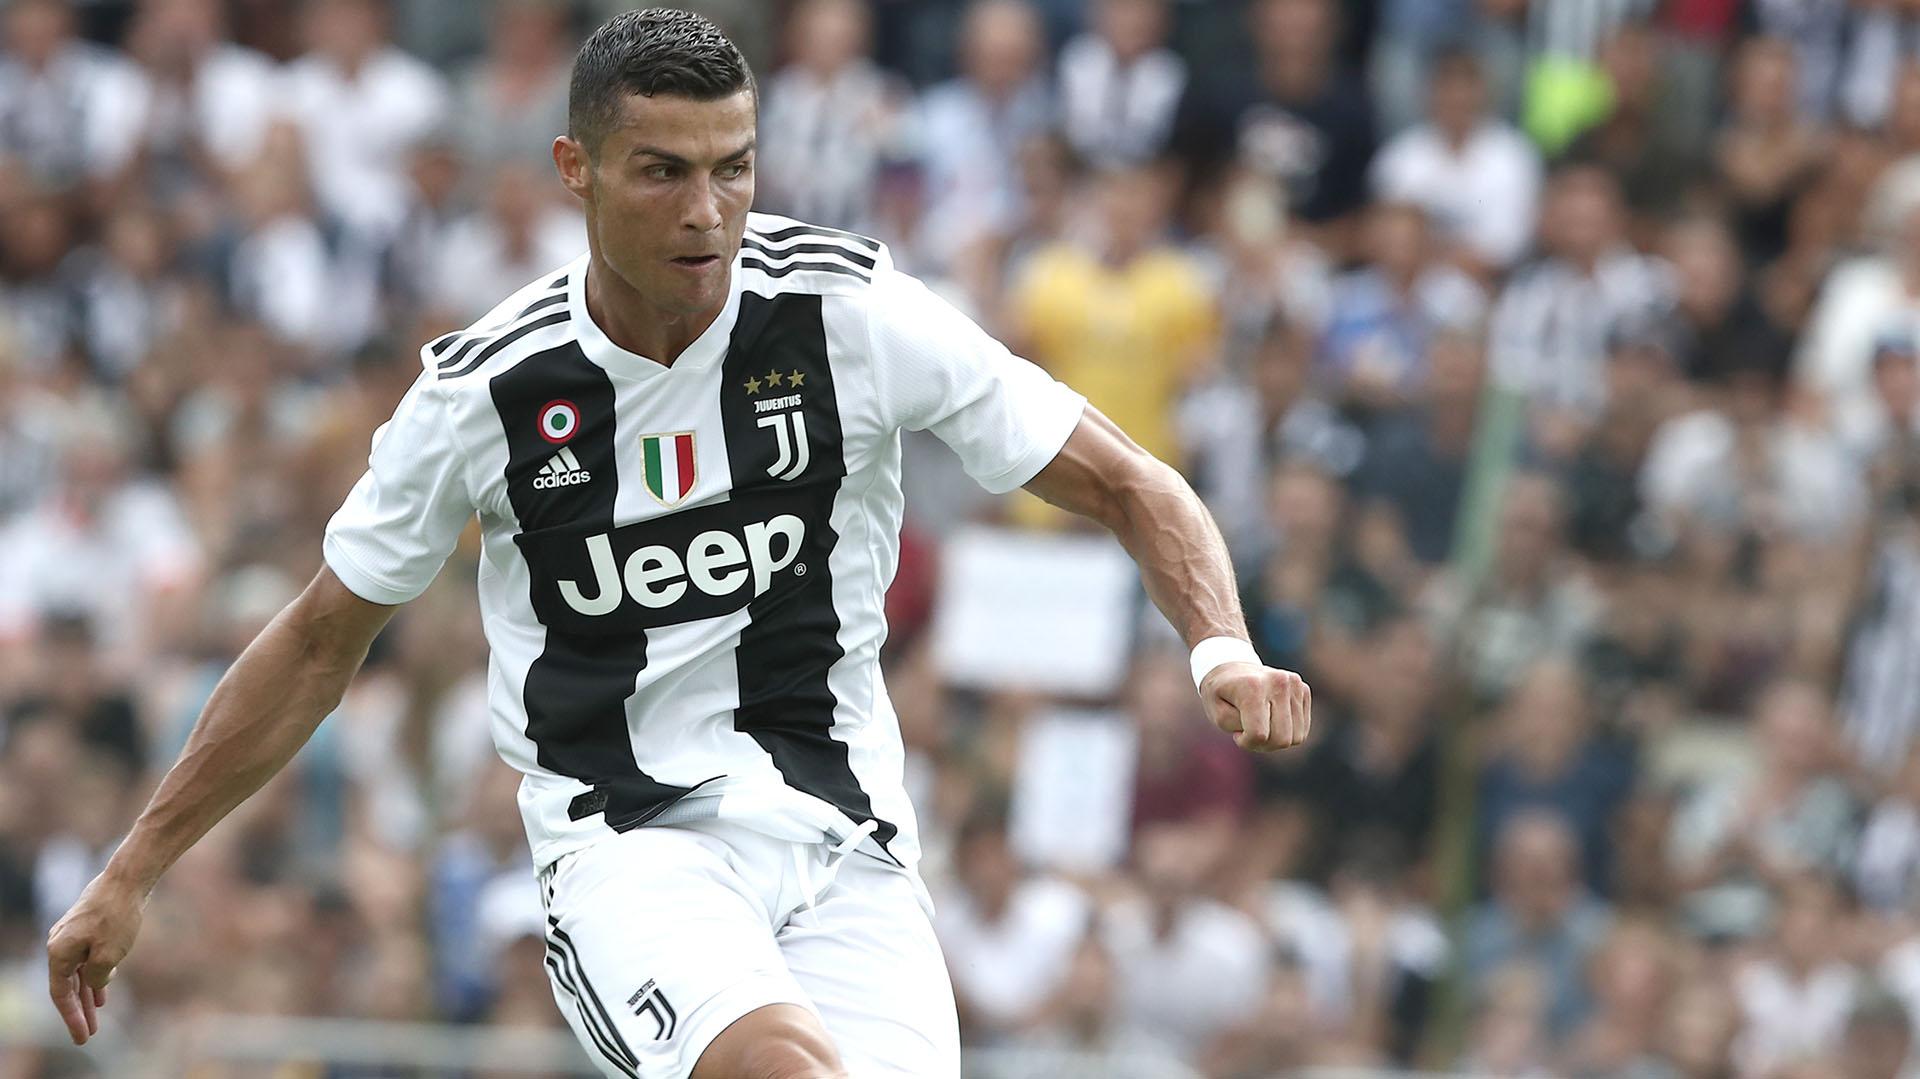 Cristiano Ronaldo debutará oficialmente en la Juventus (AFP PHOTO / Isabella Bonotto)